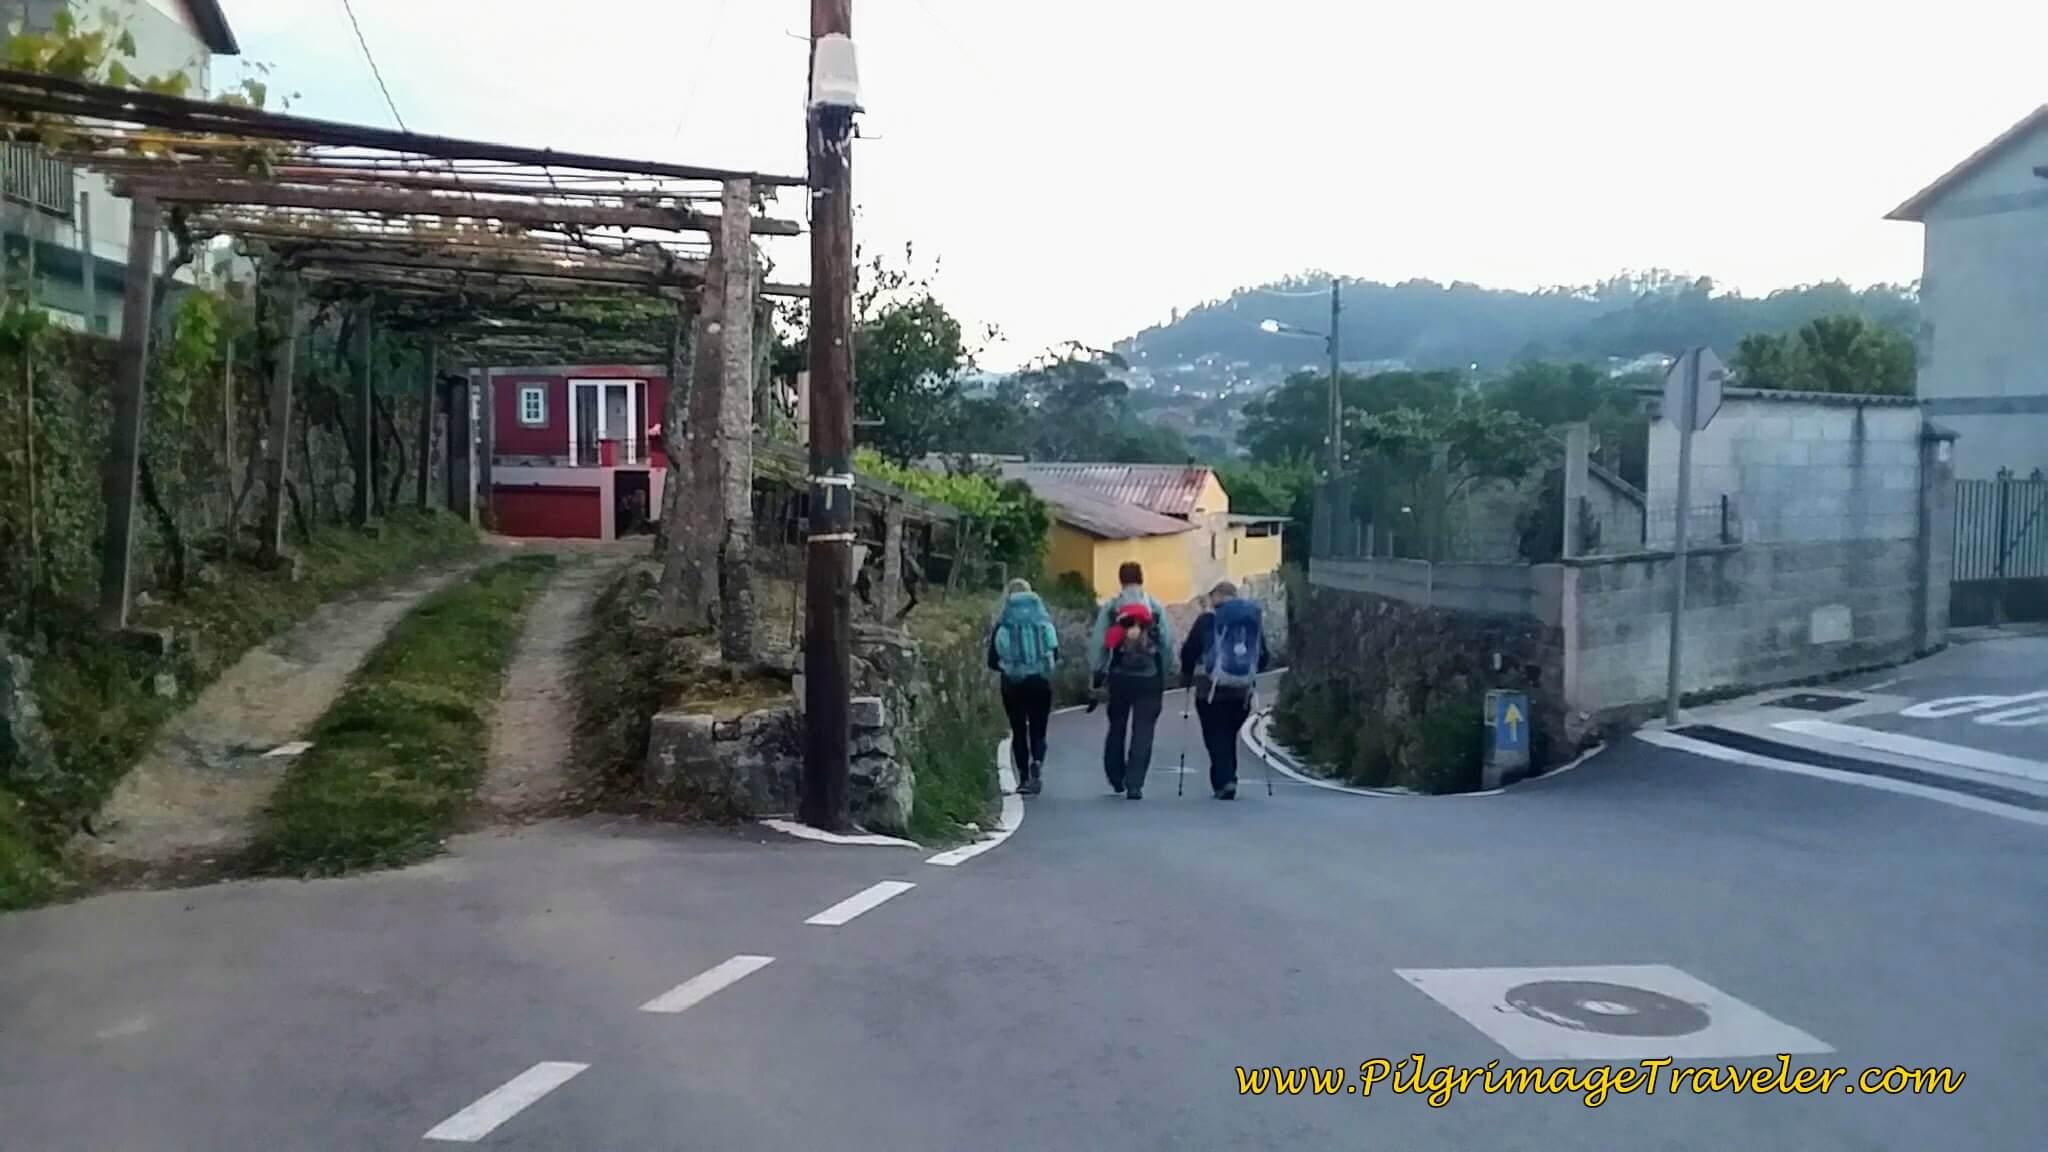 Here is a quaint arbor over a driveway to a home along the Rúa da Gándara on day twenty-three, Camino Portugués